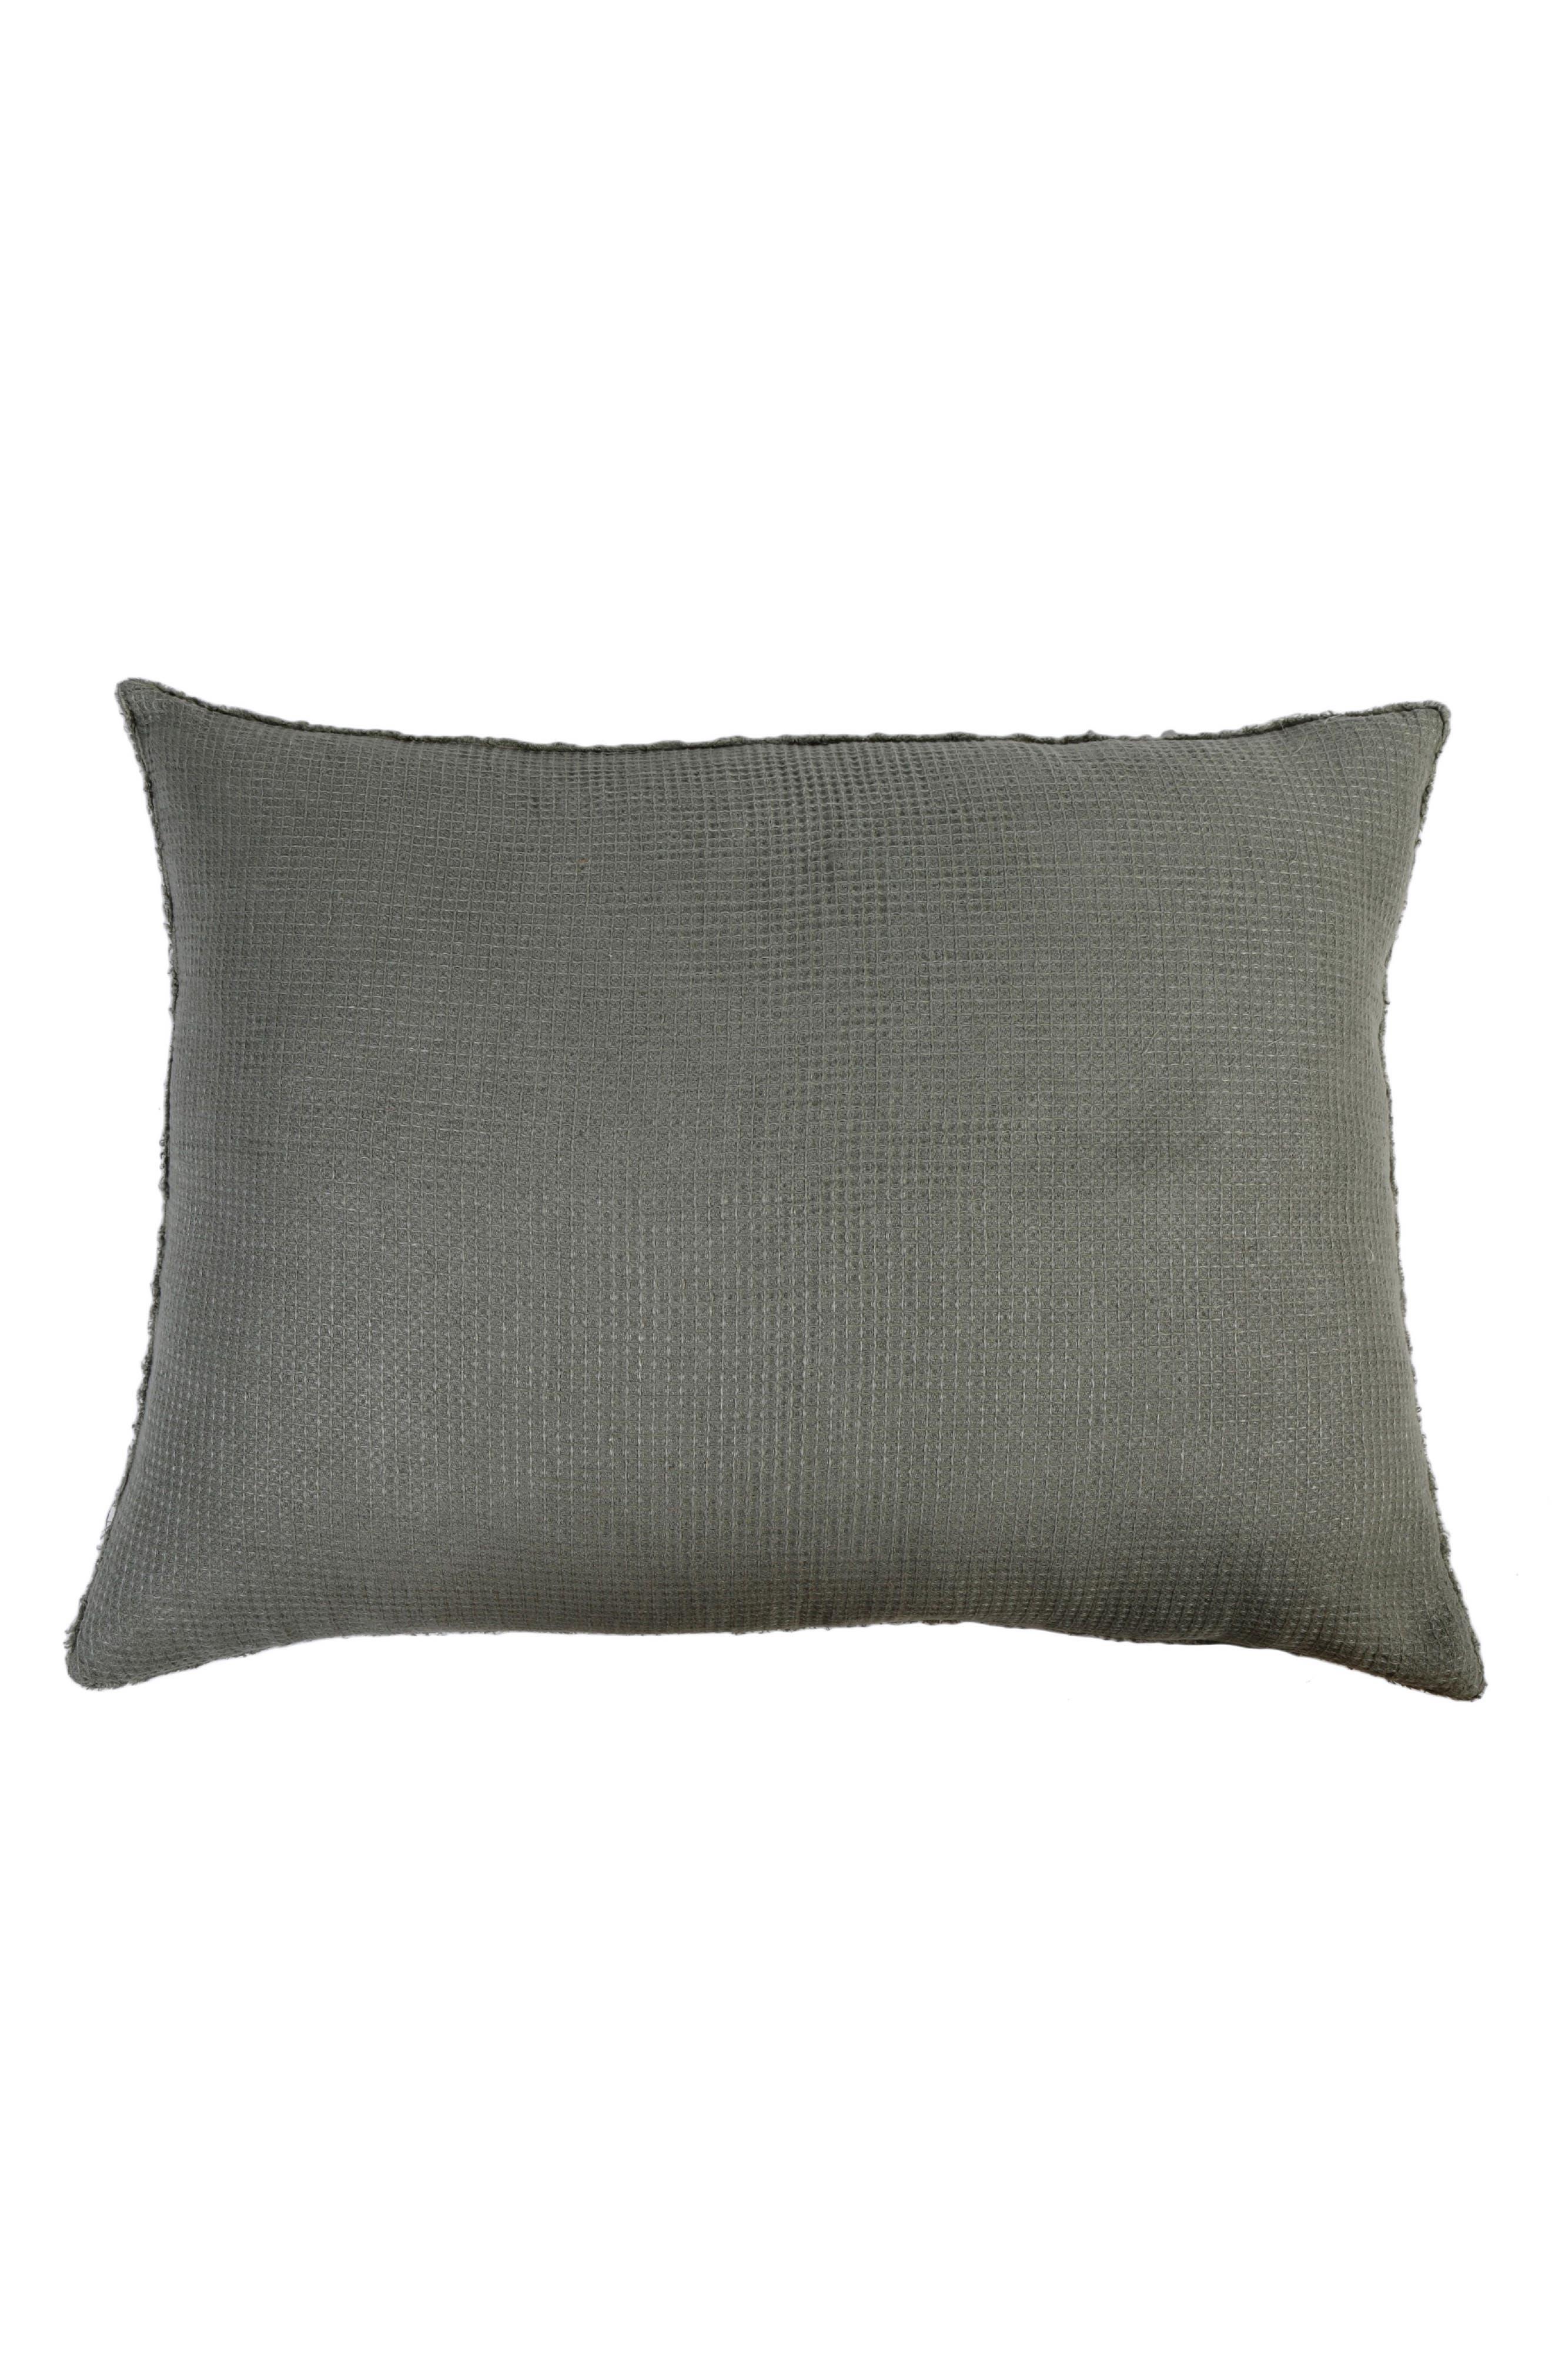 POM POM AT HOME Venice Accent Pillow, Main, color, MOSS